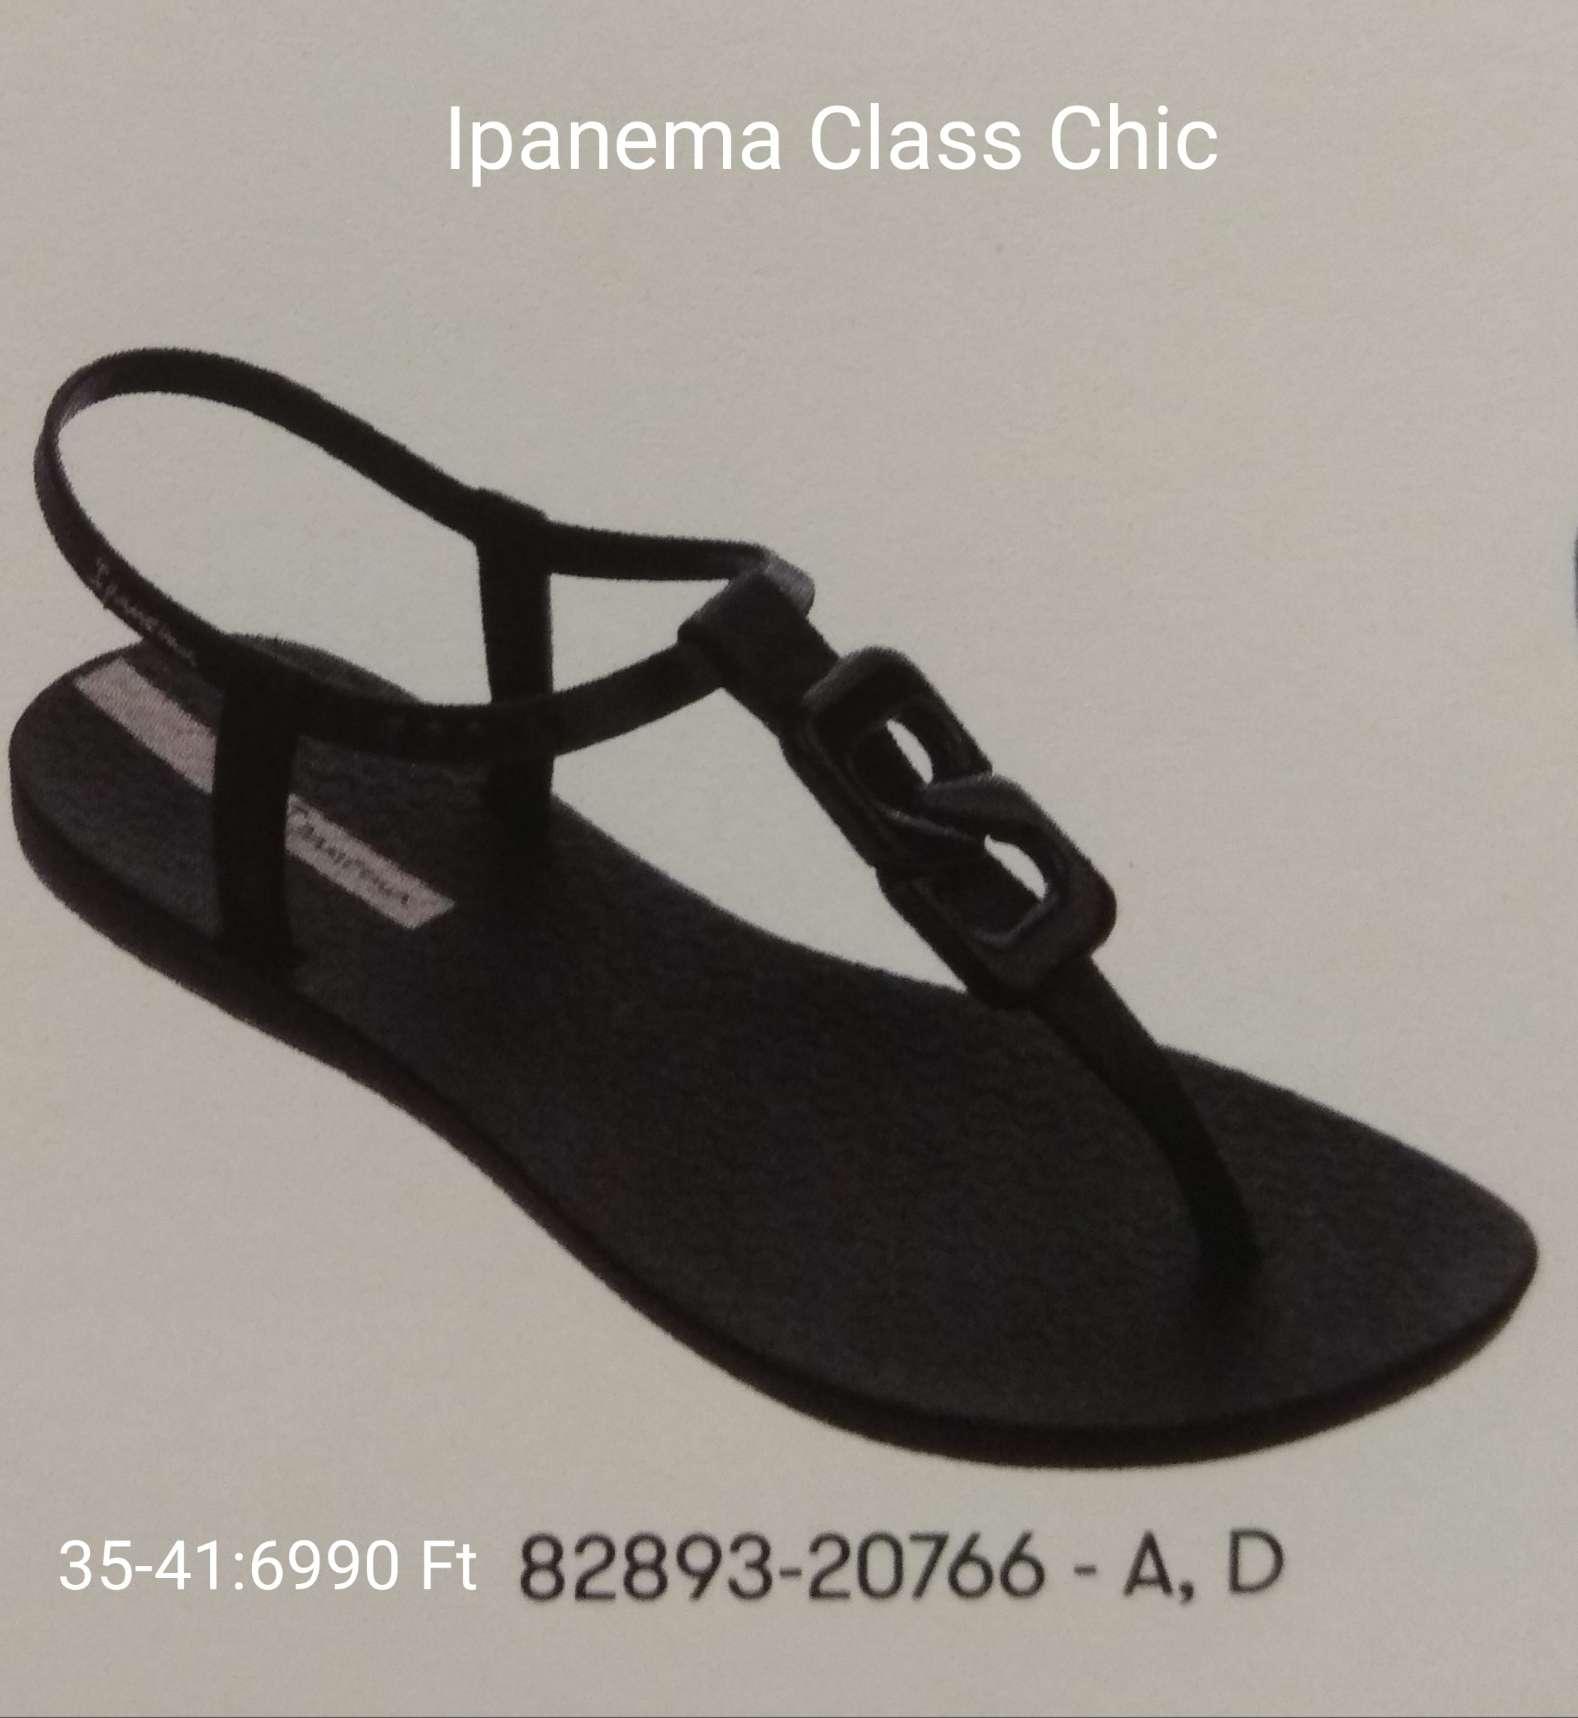 Ipanema Class Chic